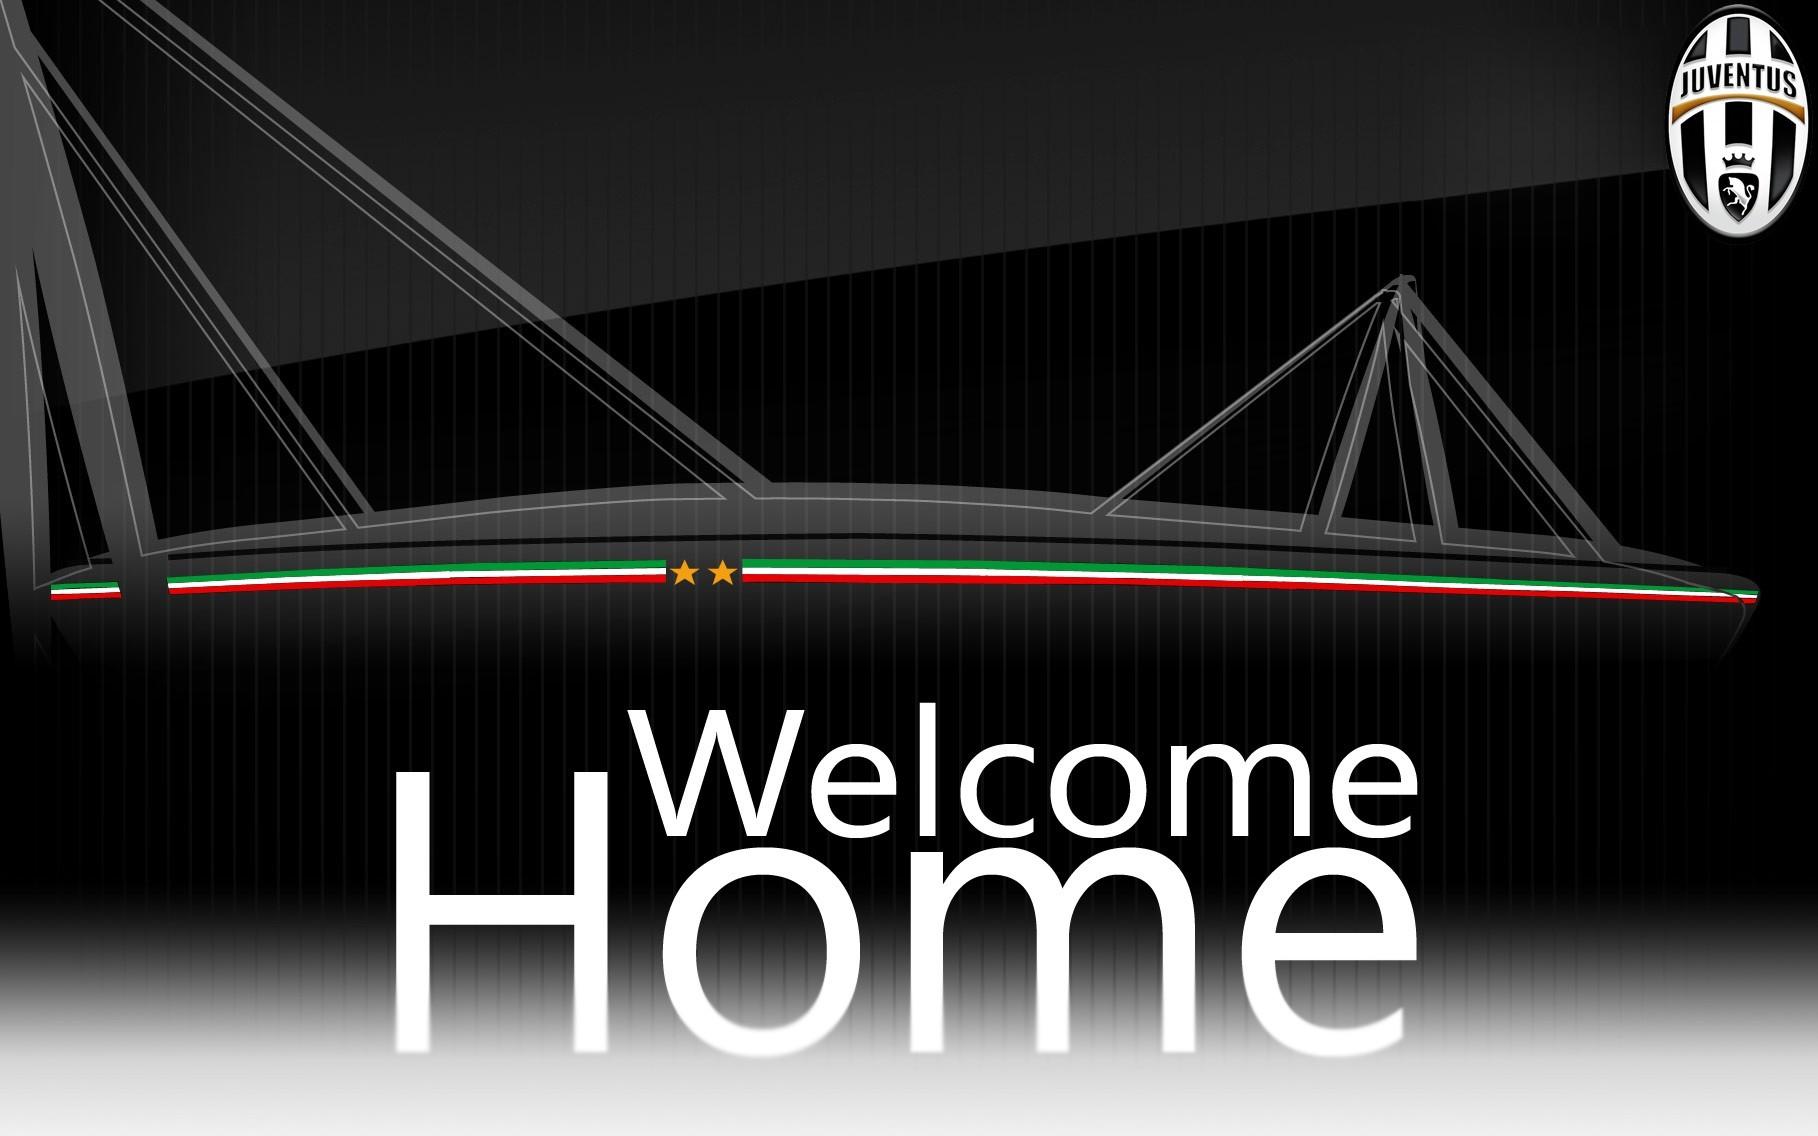 welcome home stadium juve welcome home stadium juve